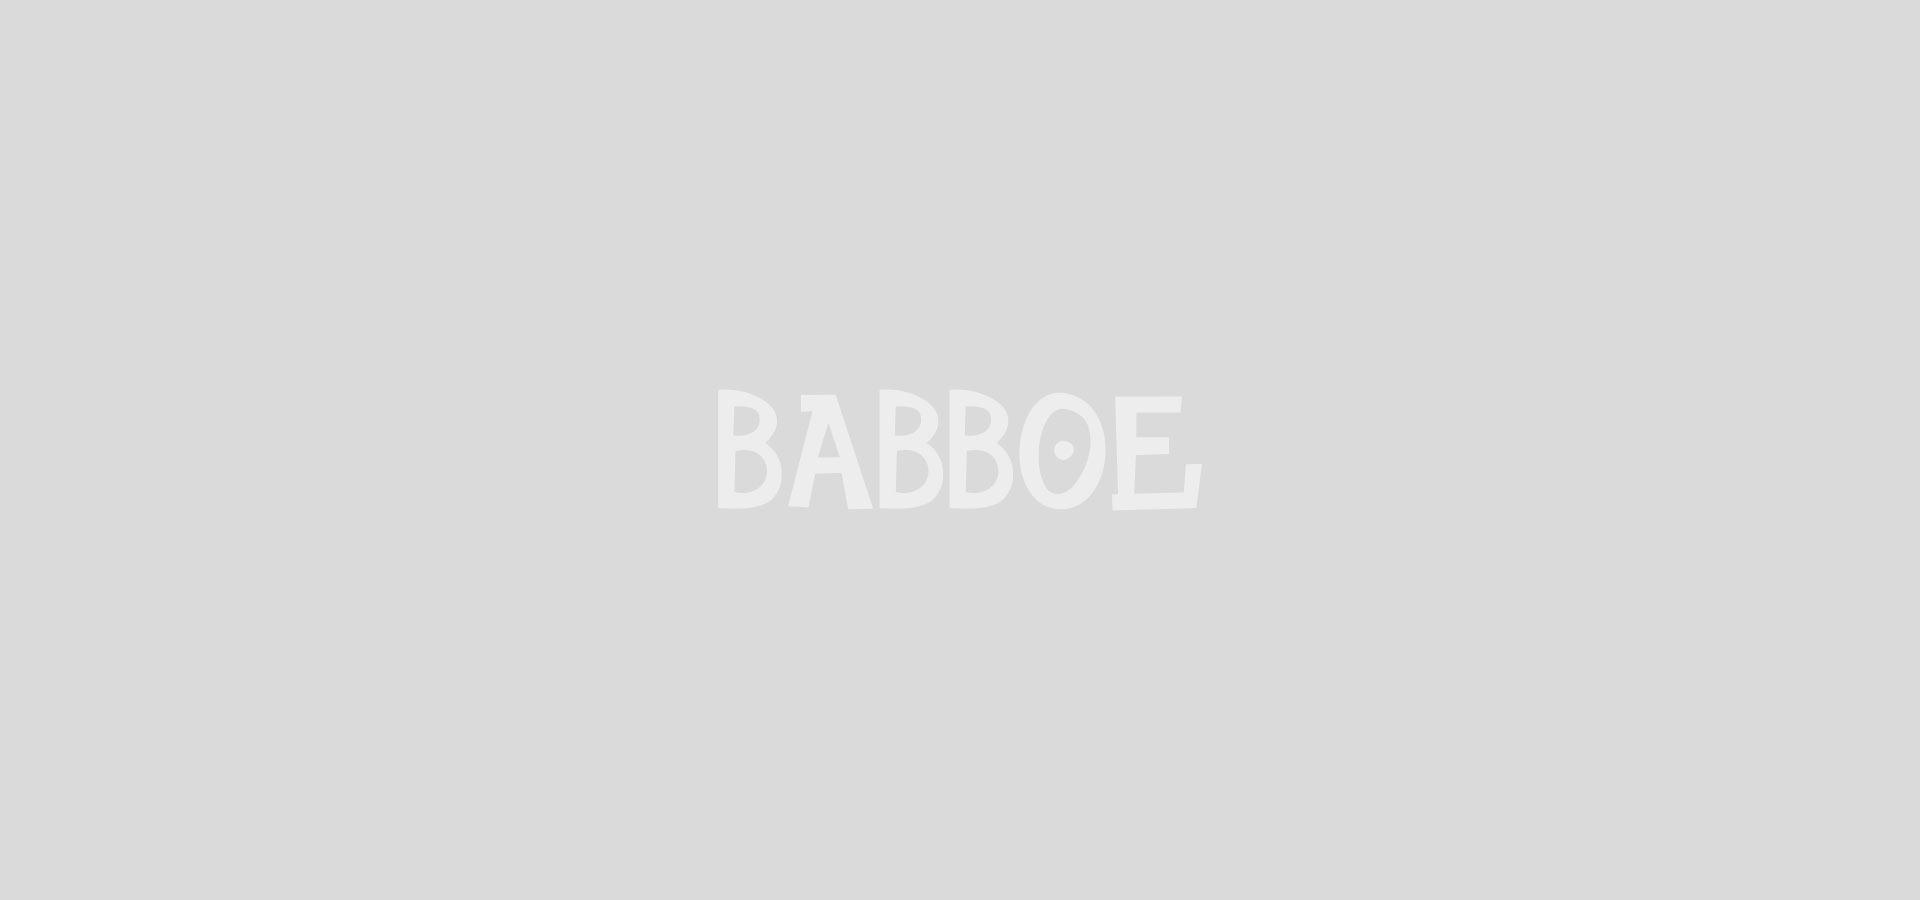 Babboe Max